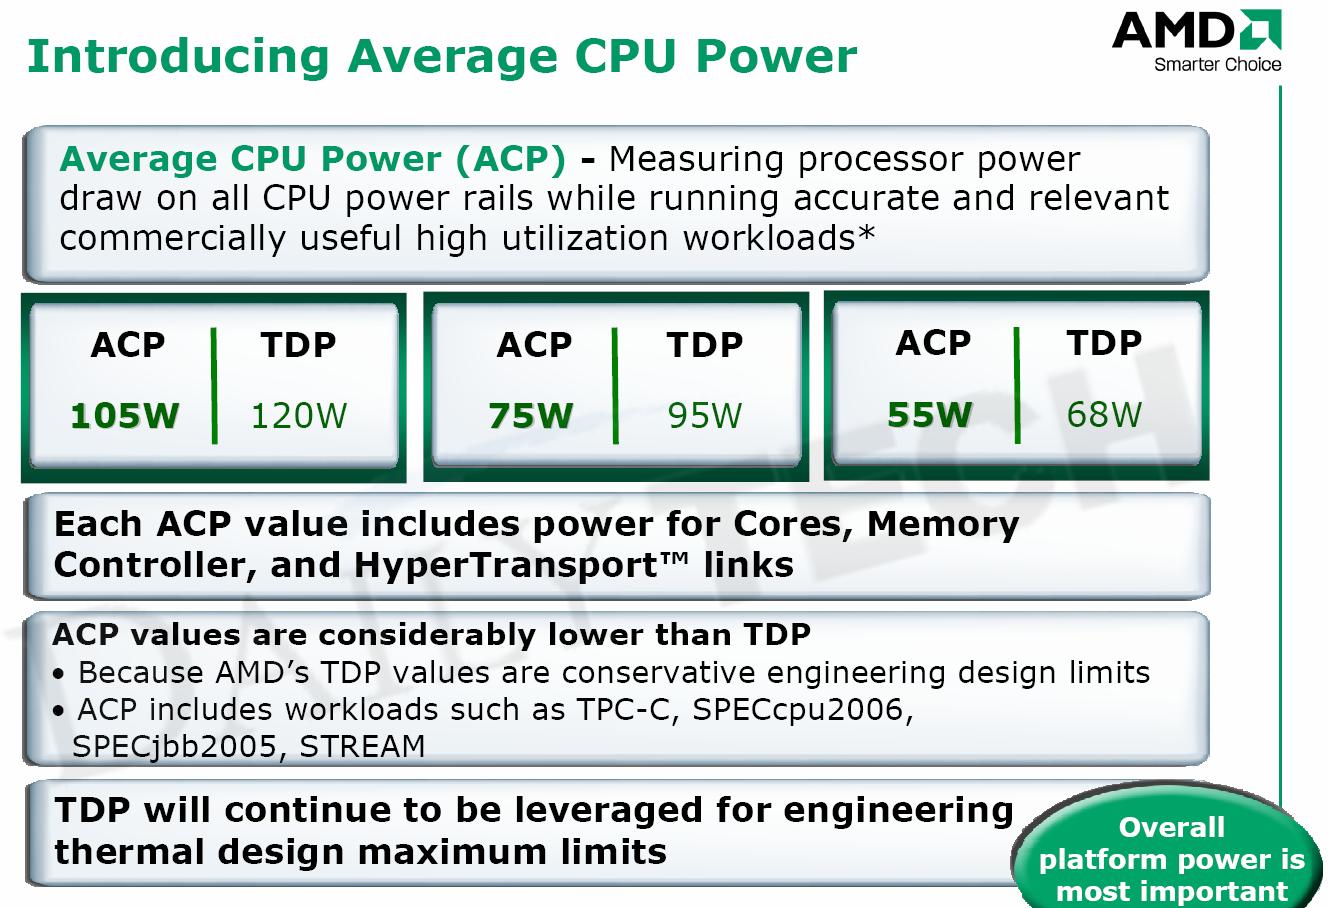 AMD ACP